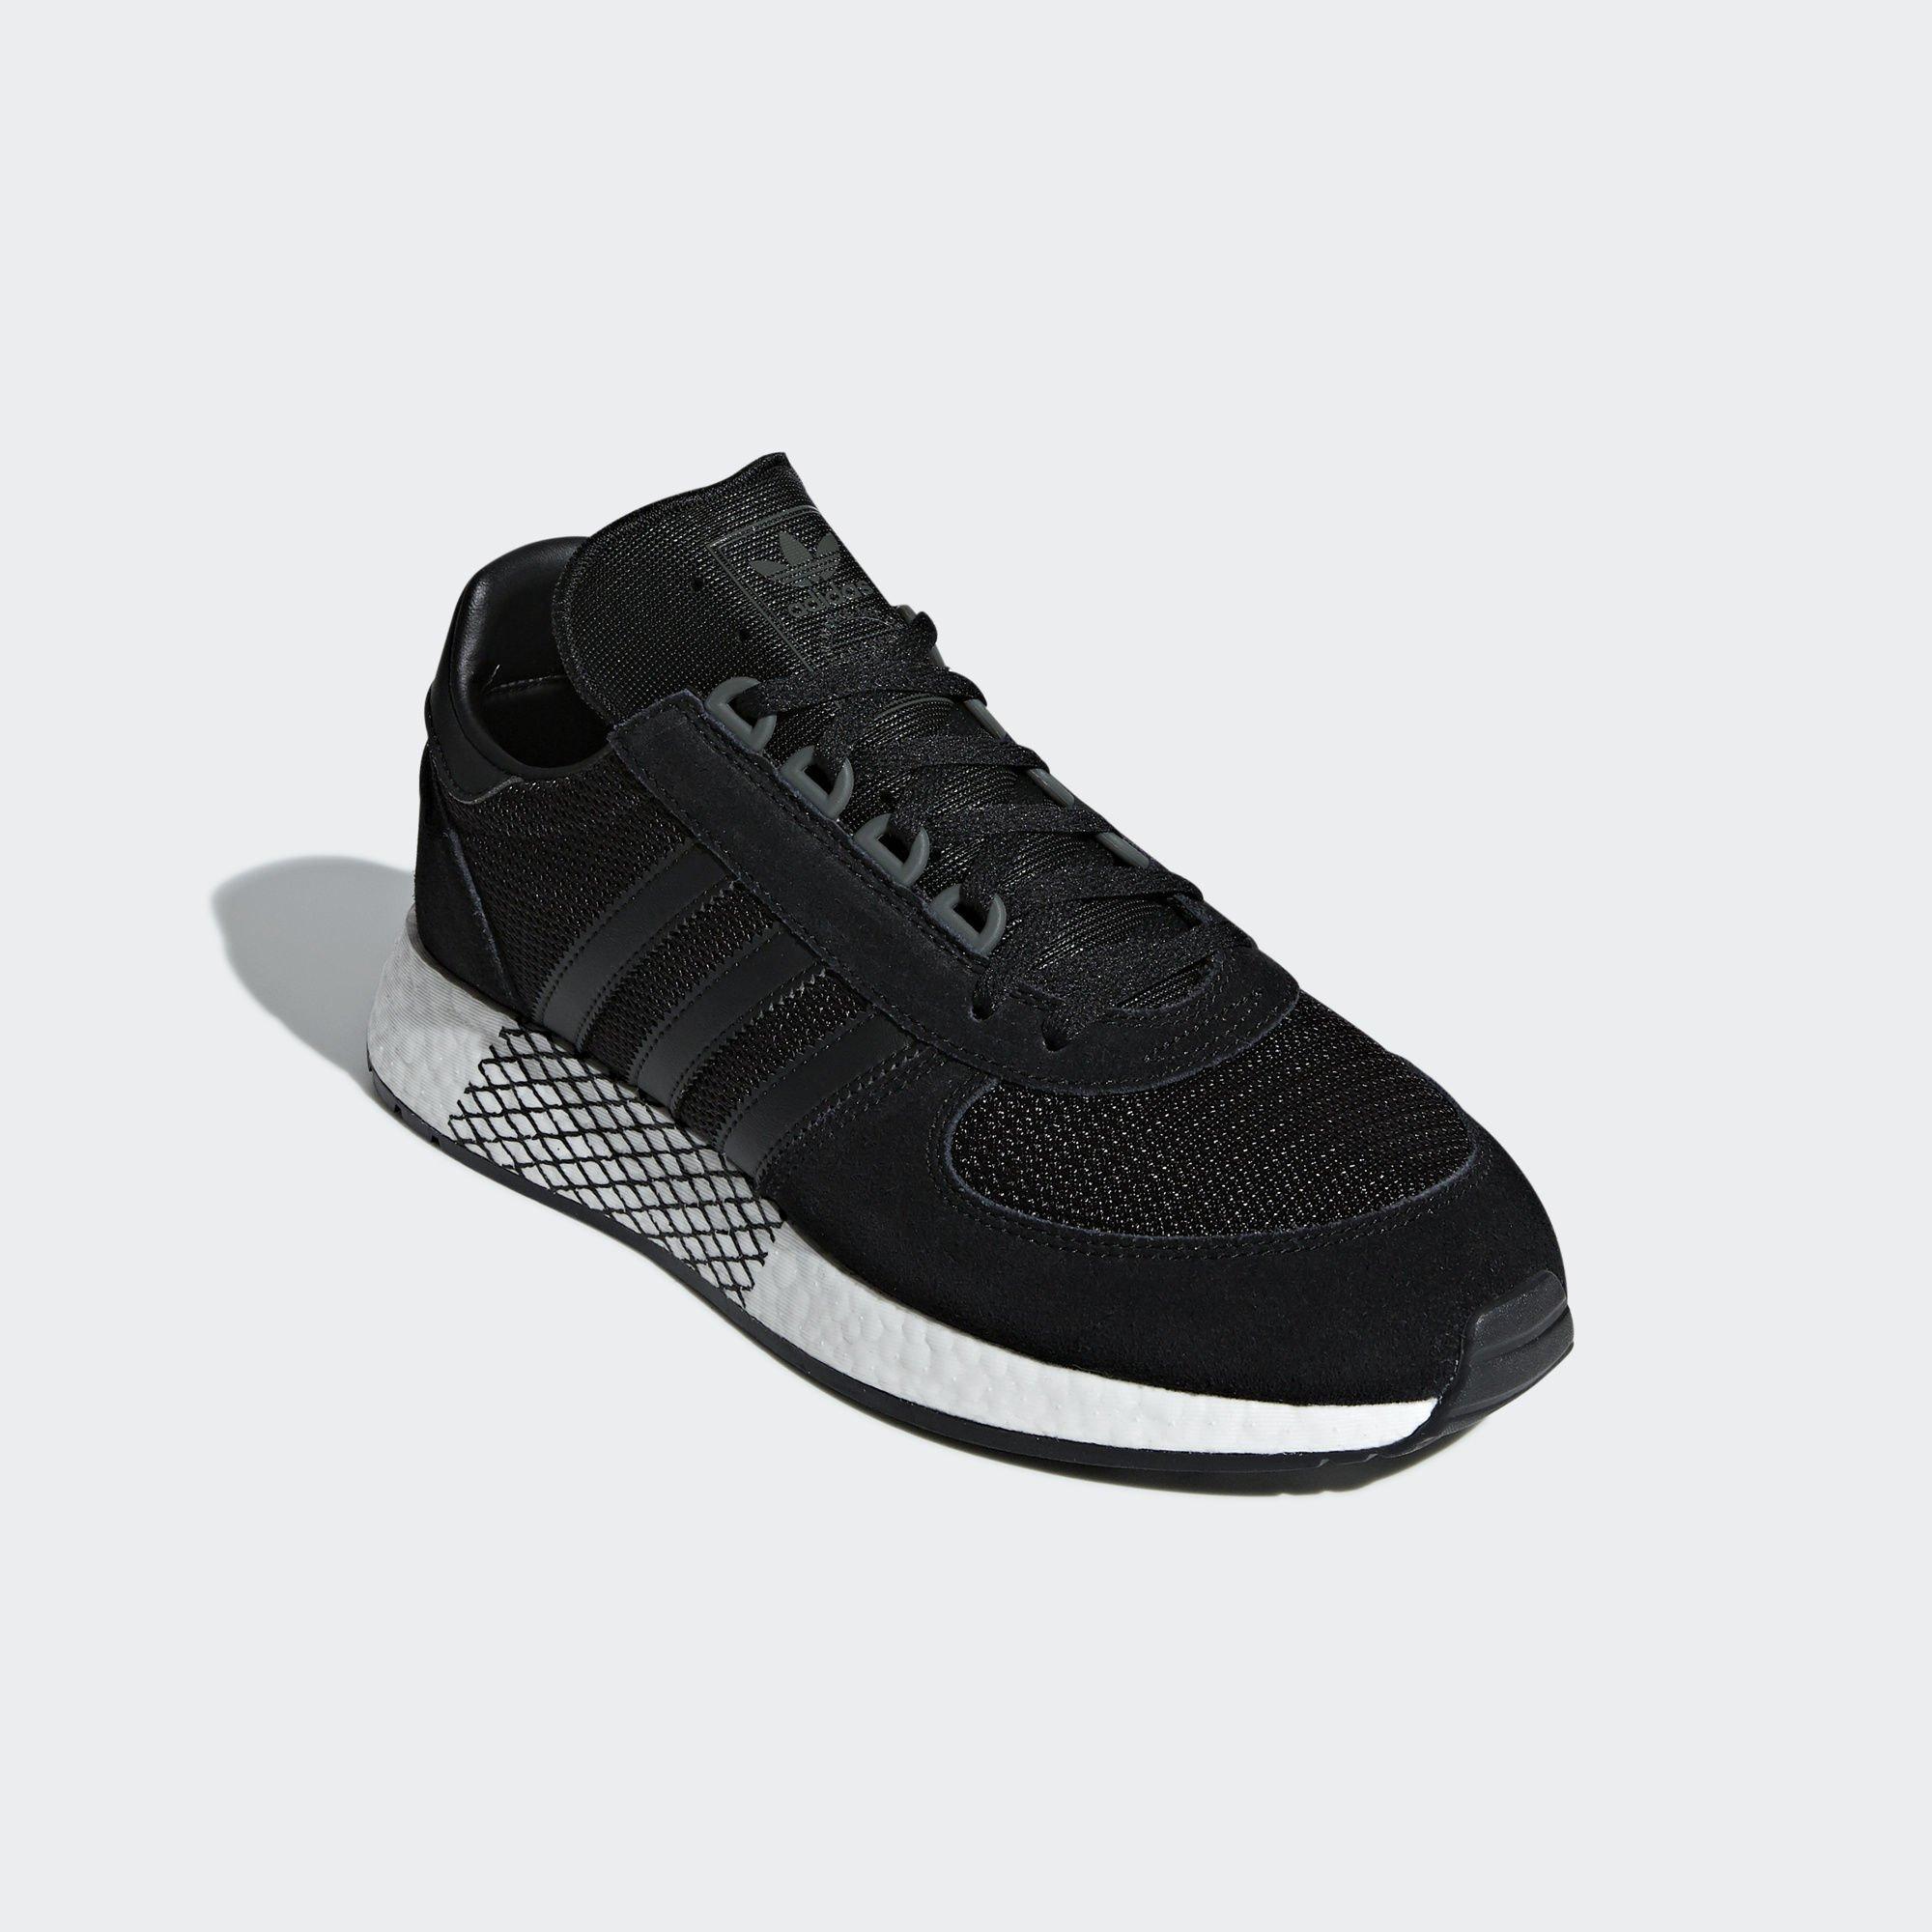 Adidas Marathon EE3656